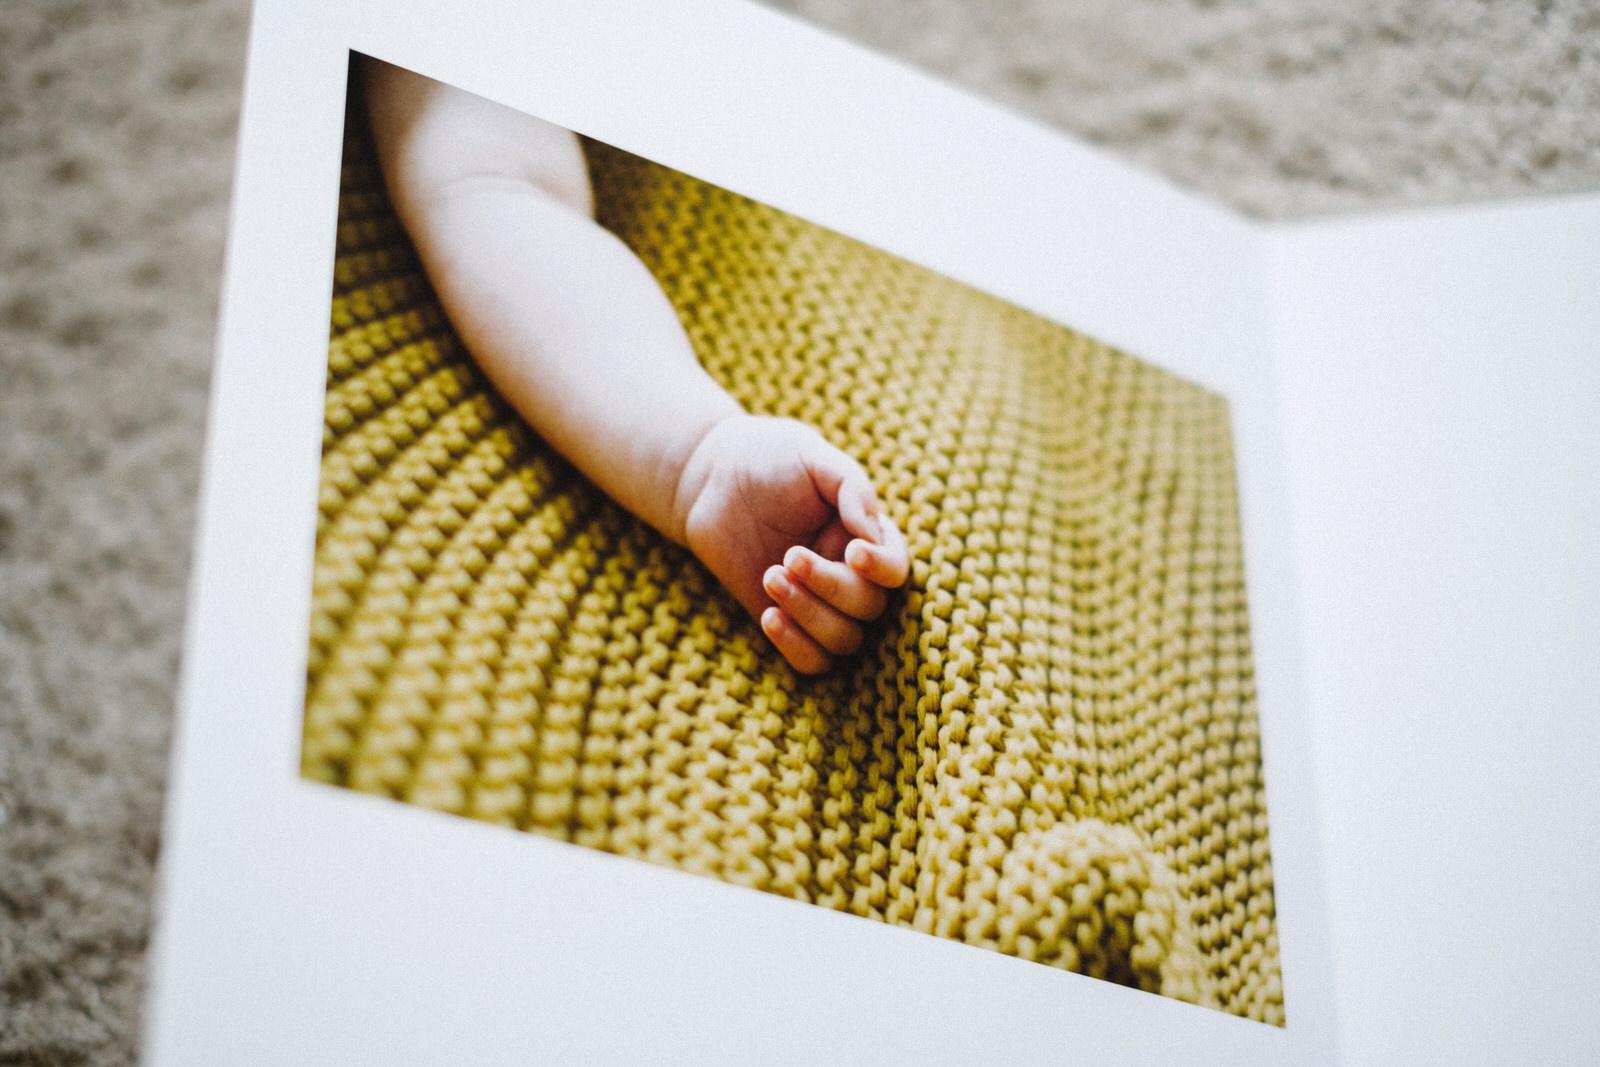 family-story-photos-photo-album-15.jpg